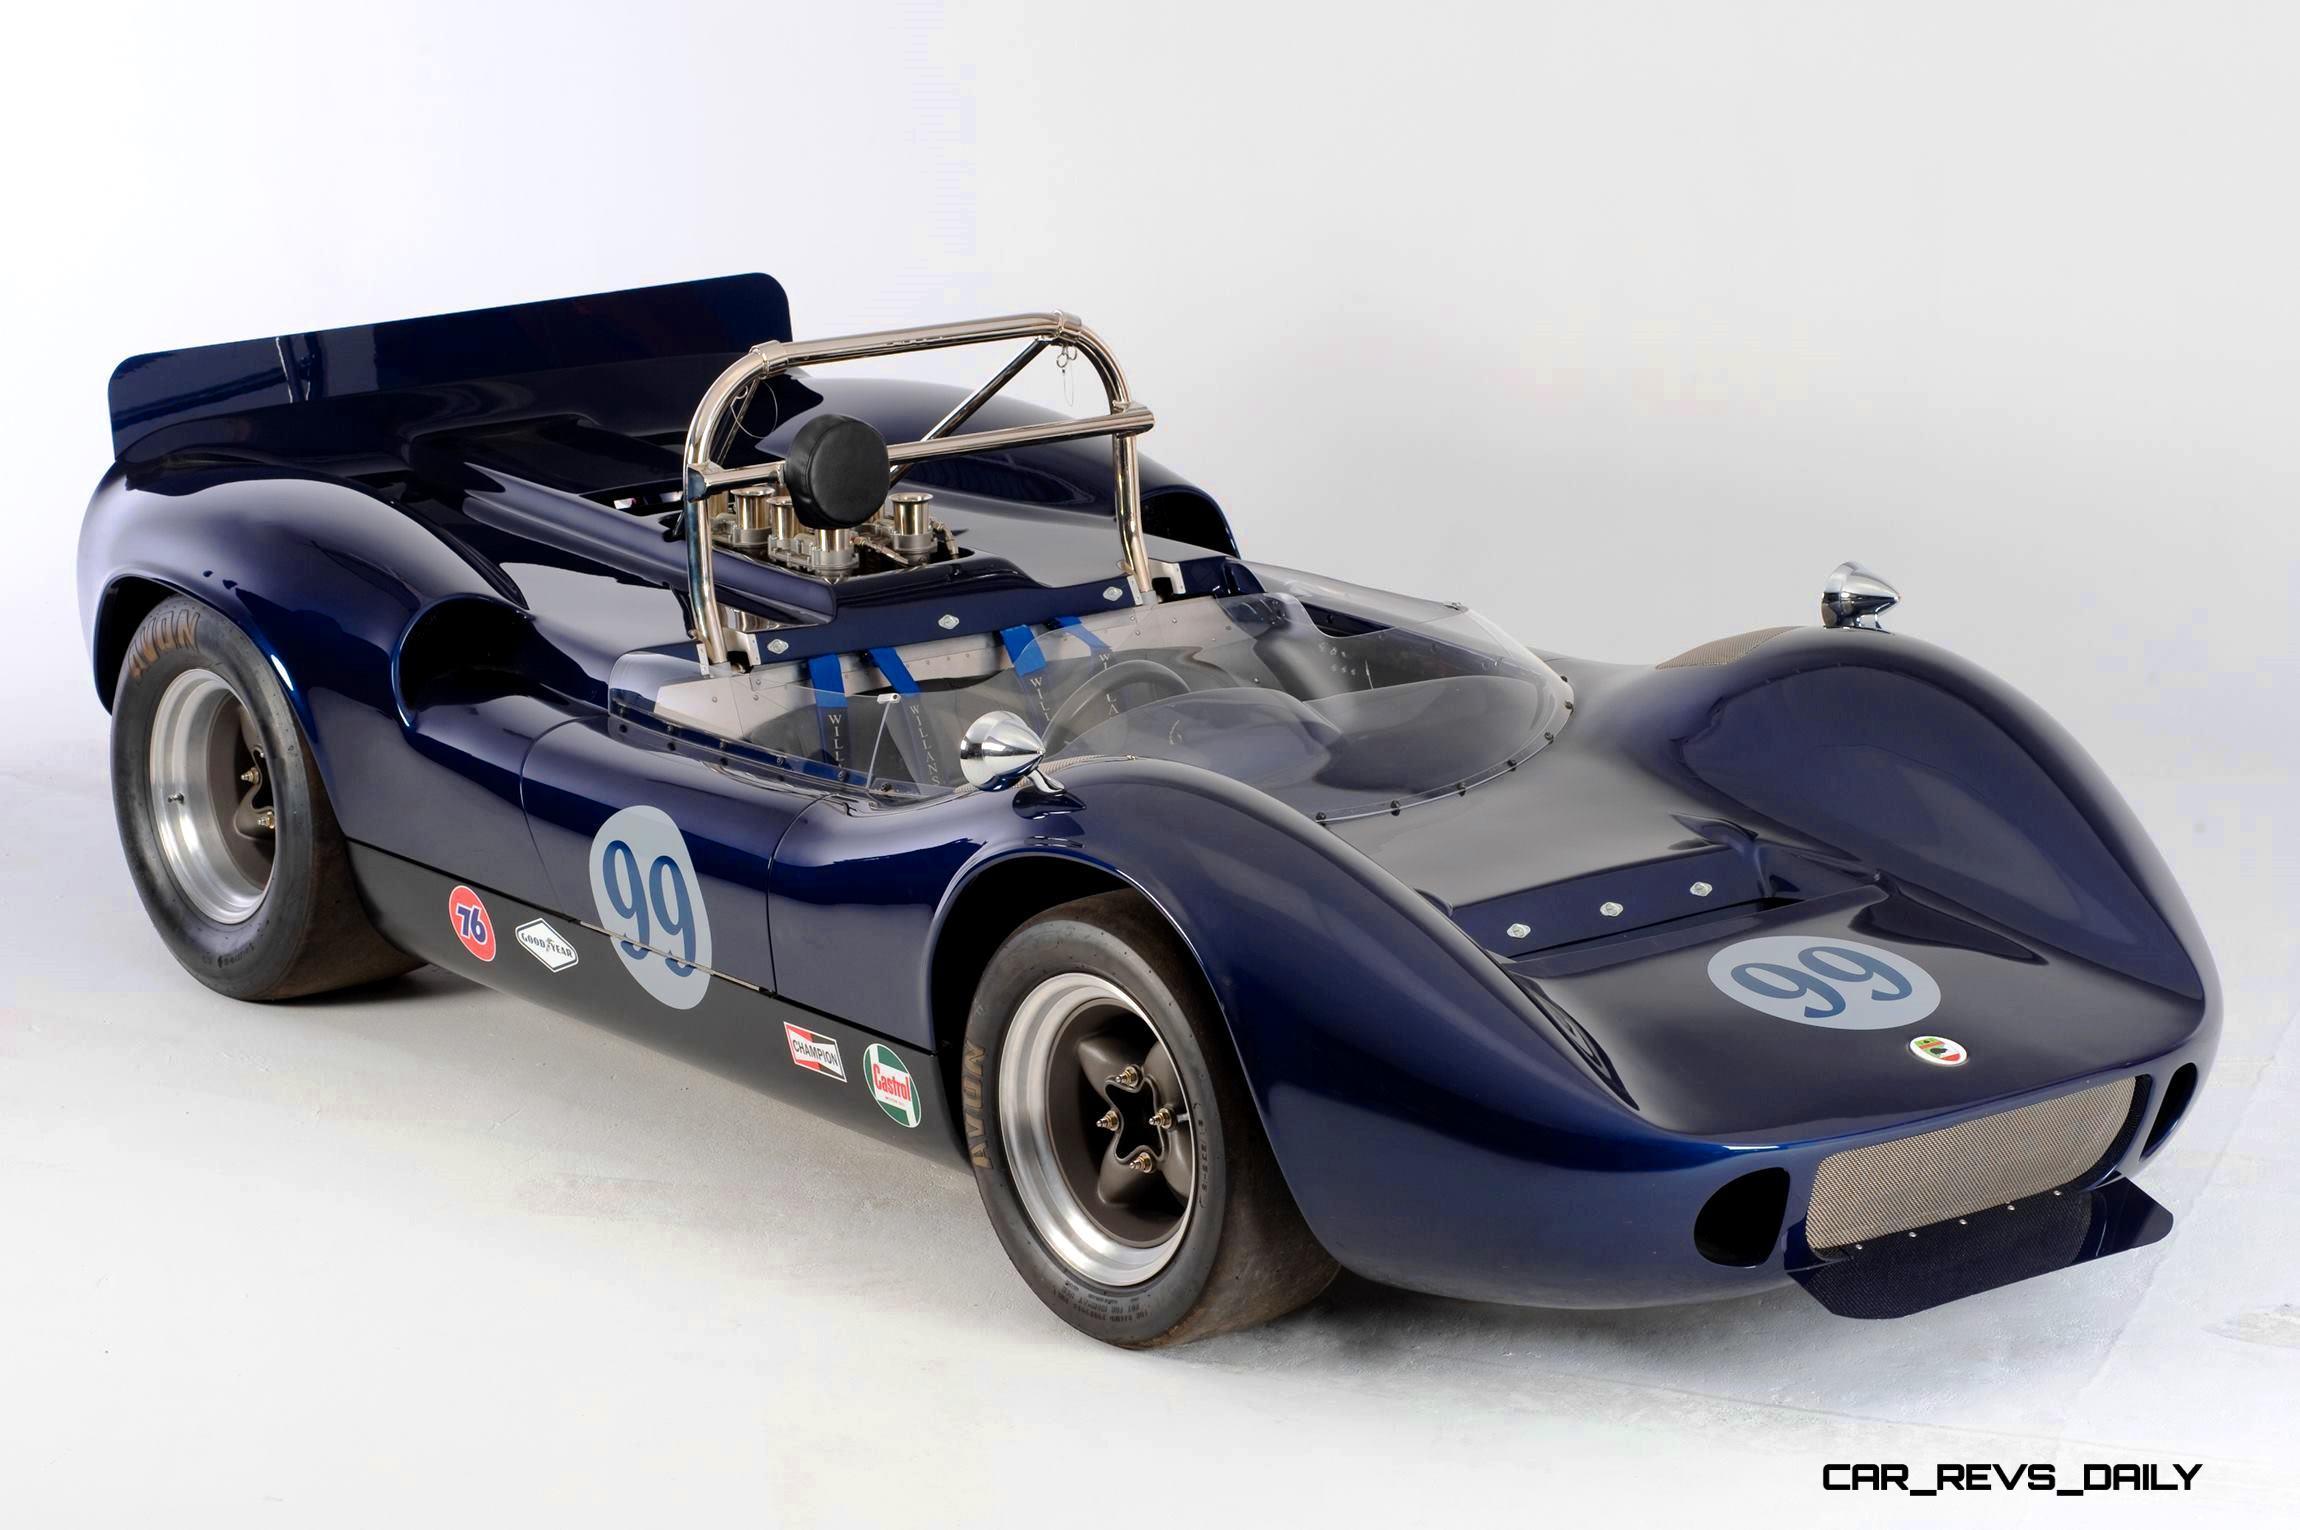 Meet the Original Black Swan The McLaren M1